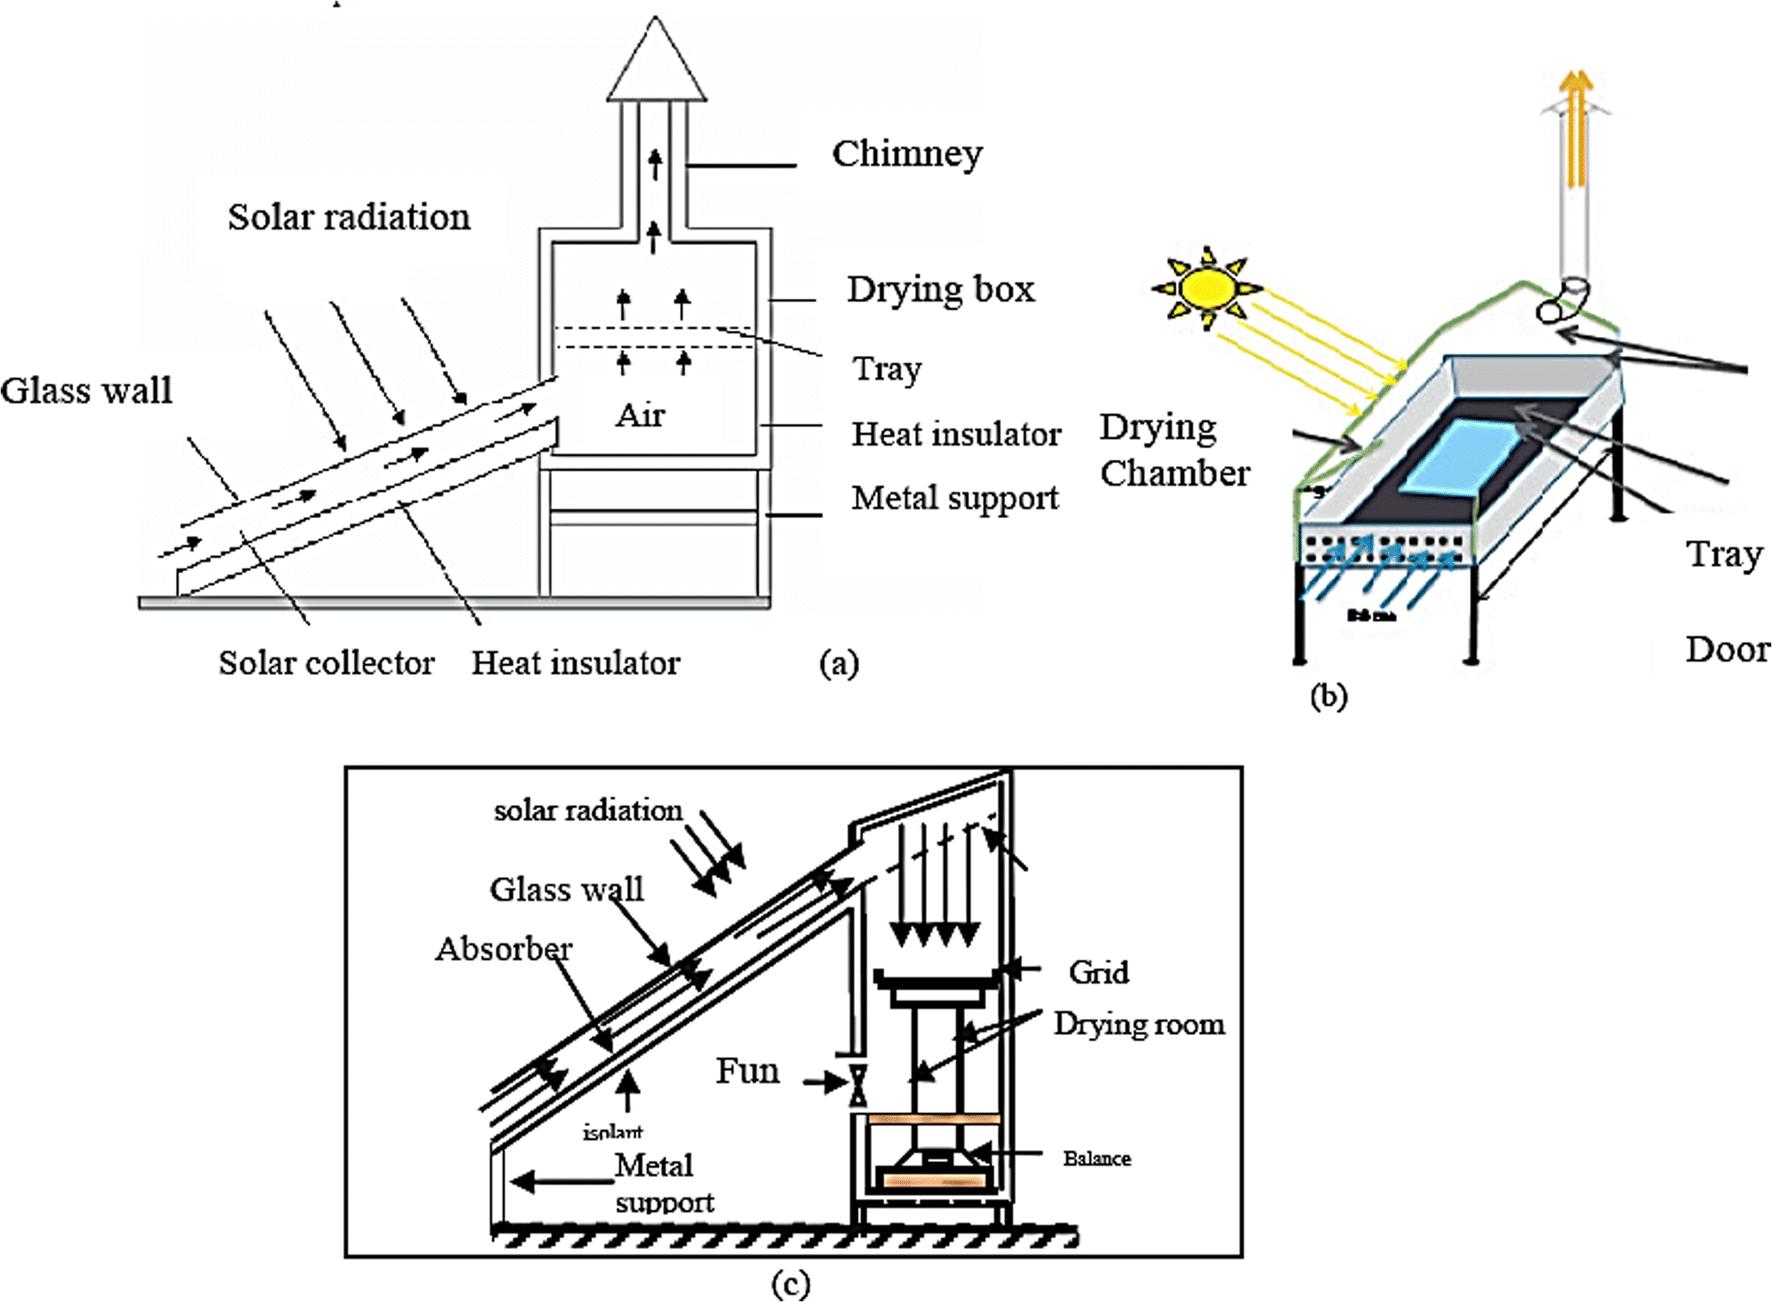 new dryer wiring ecn electrical forums wiring diagram schematic name rh 3 8 2 systembeimroulette de